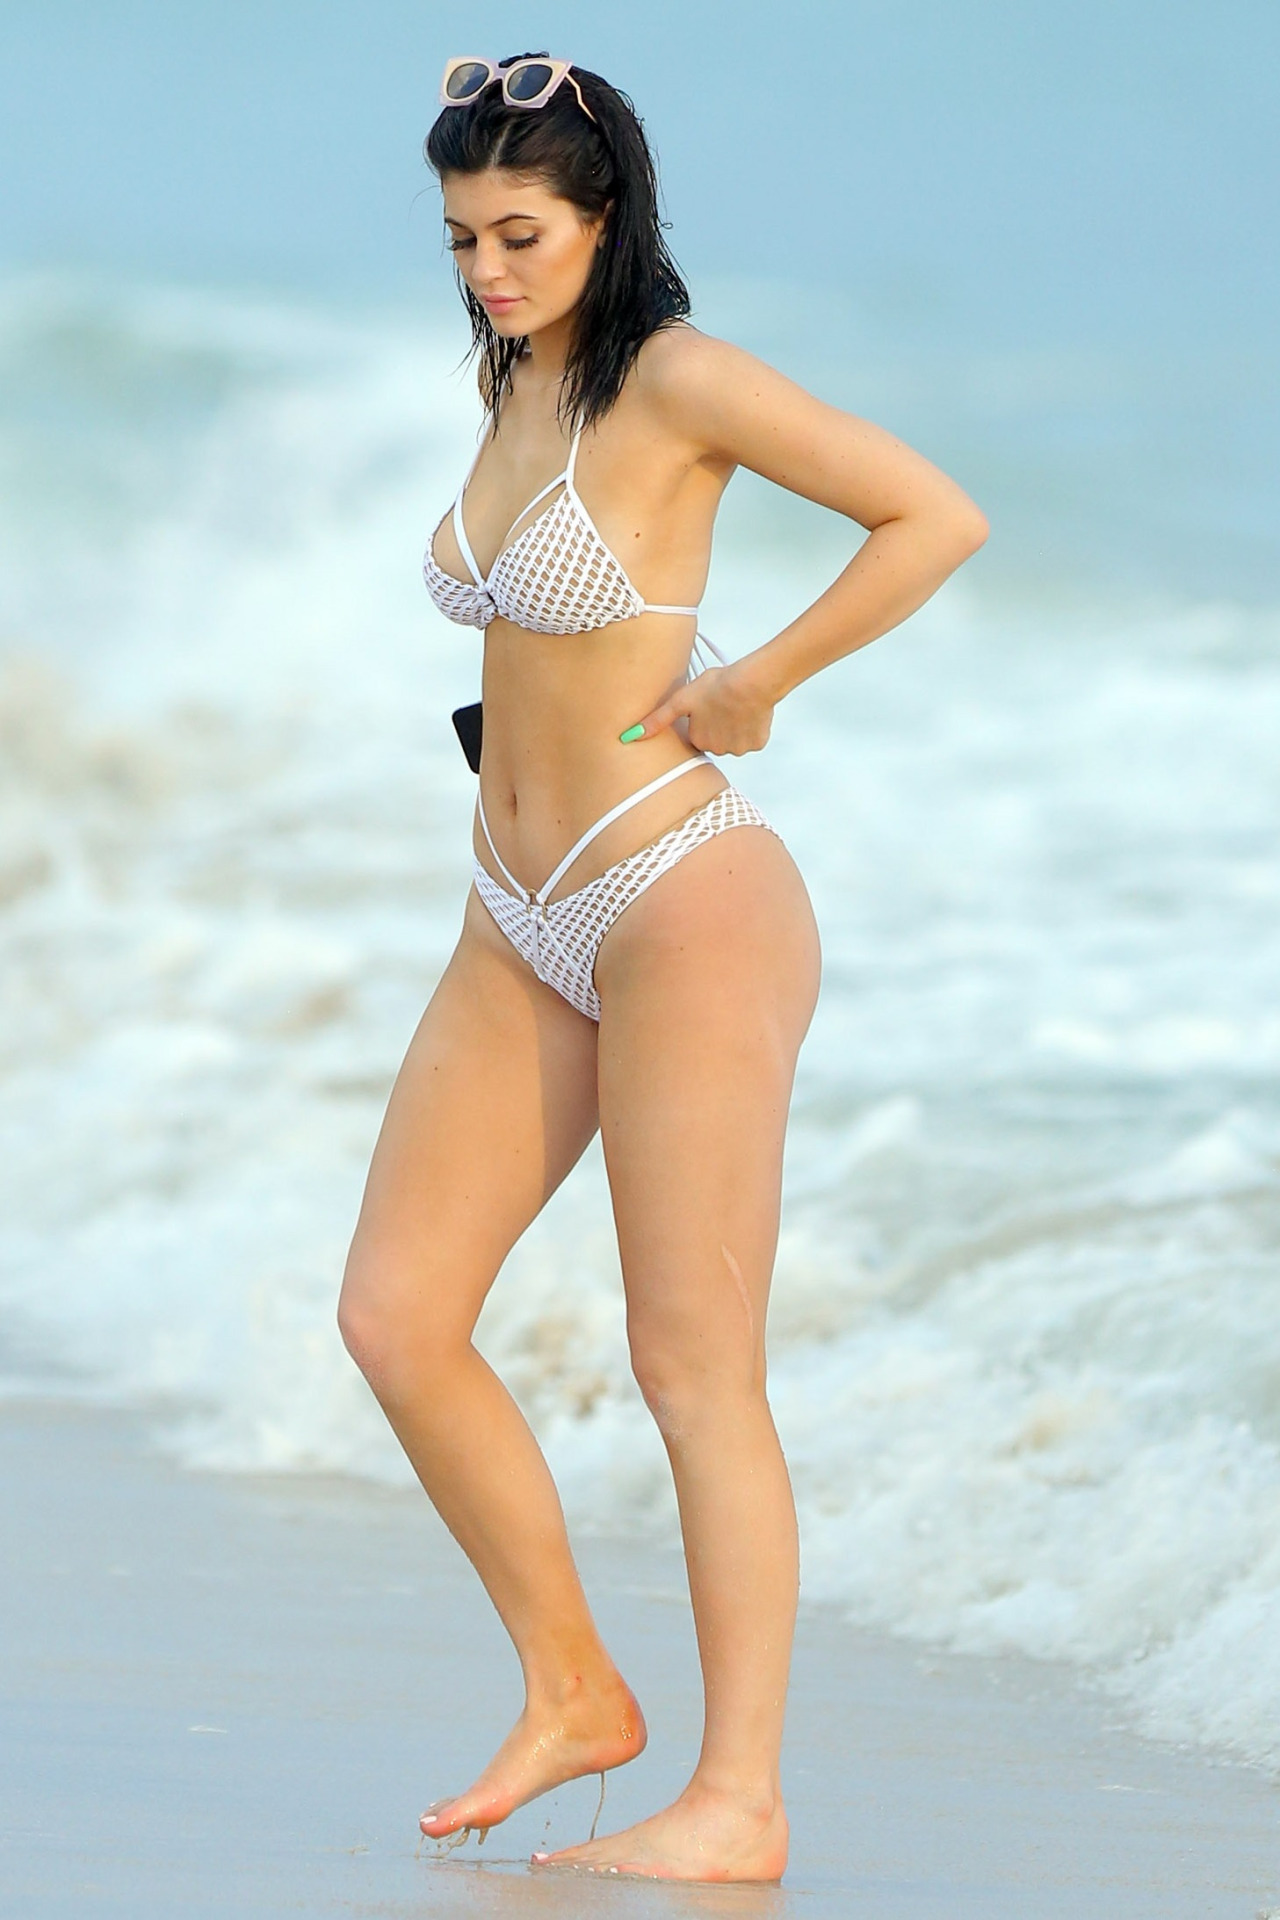 Kylie Jenner looks stunning in white bikini